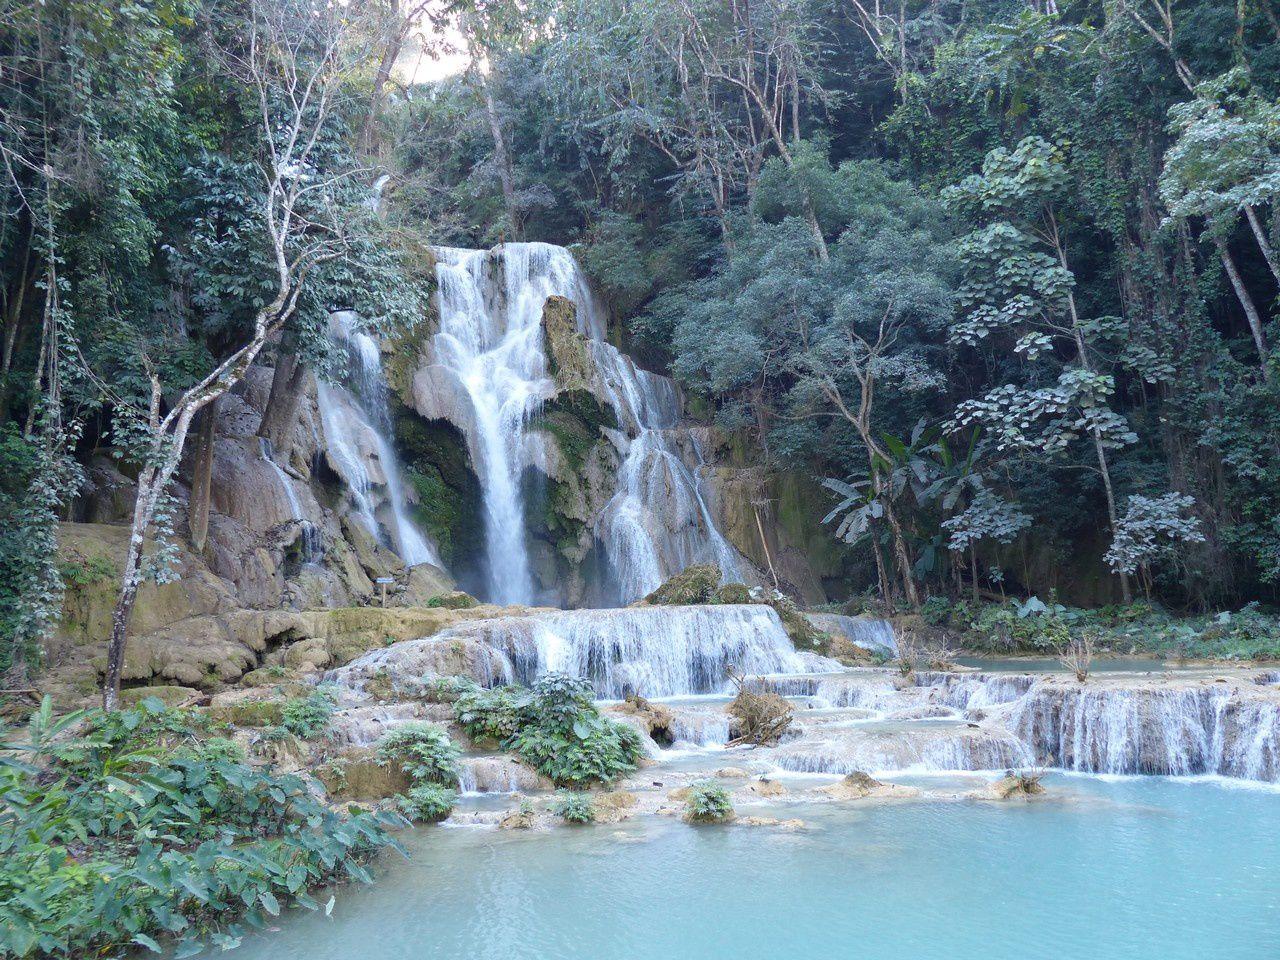 Luang Prabang, et Muang Ngoi : Encore des paysages splendides